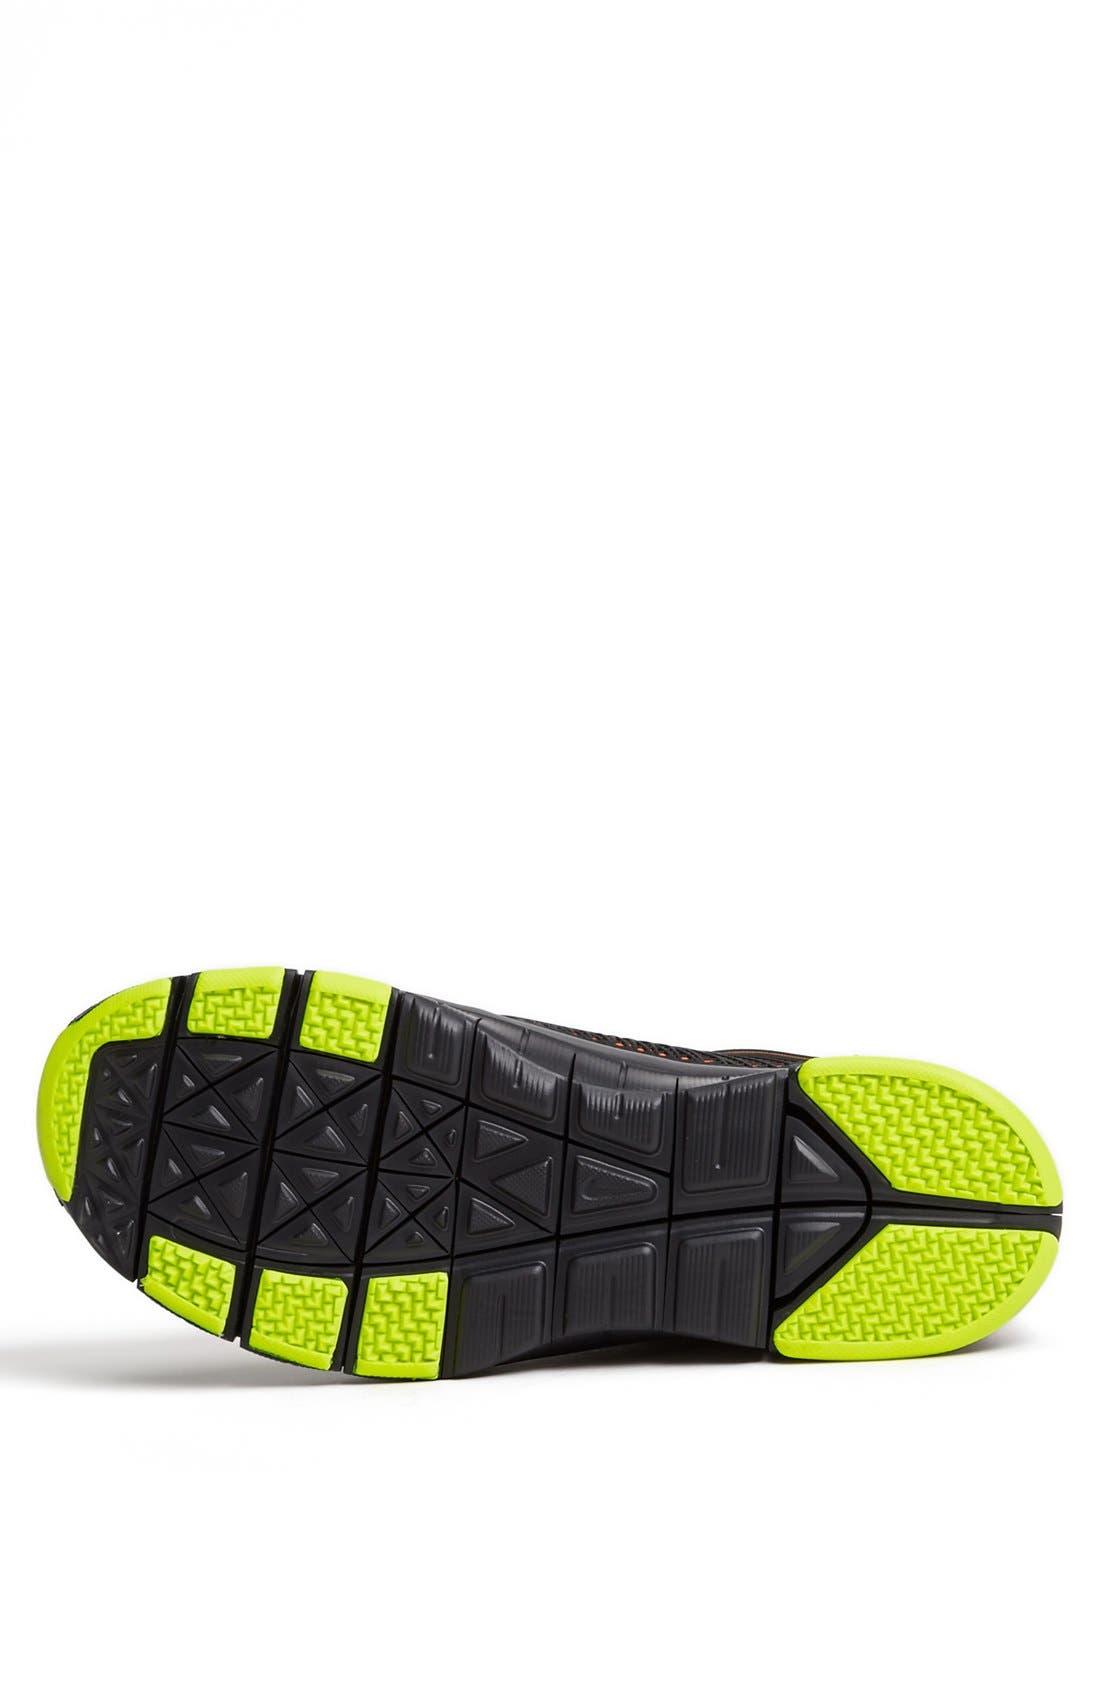 Alternate Image 4  - Nike 'Free Trainer 3.0 NRG' Training Shoe (Men)